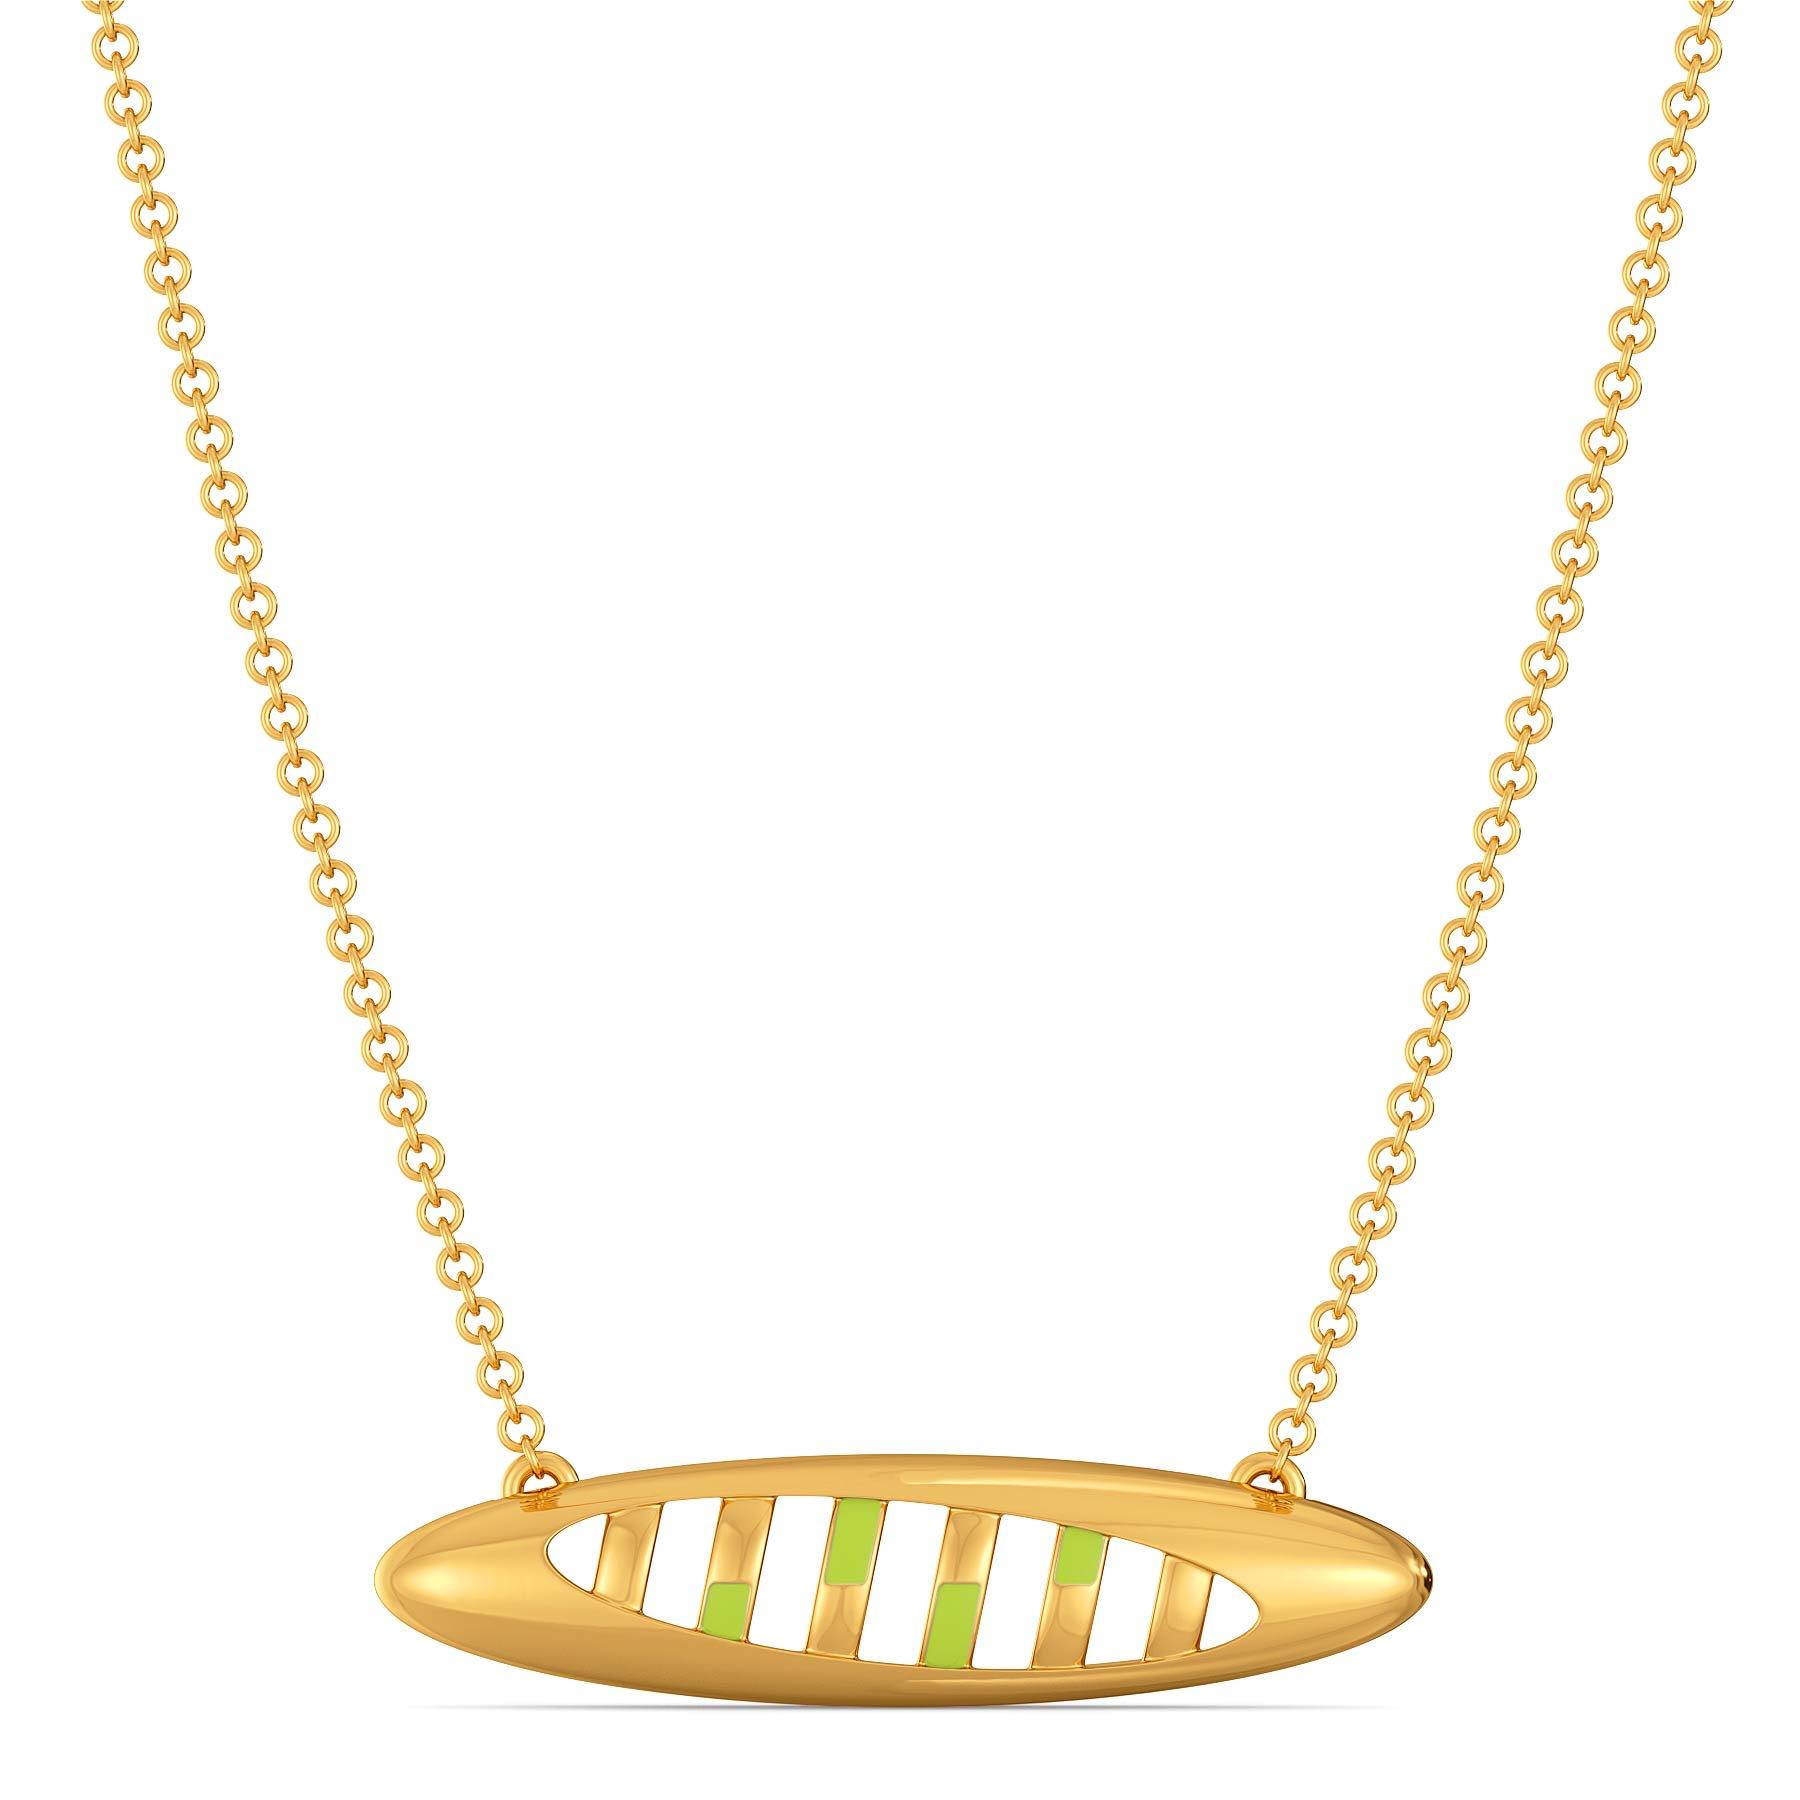 Lime Limerick Gold Necklaces